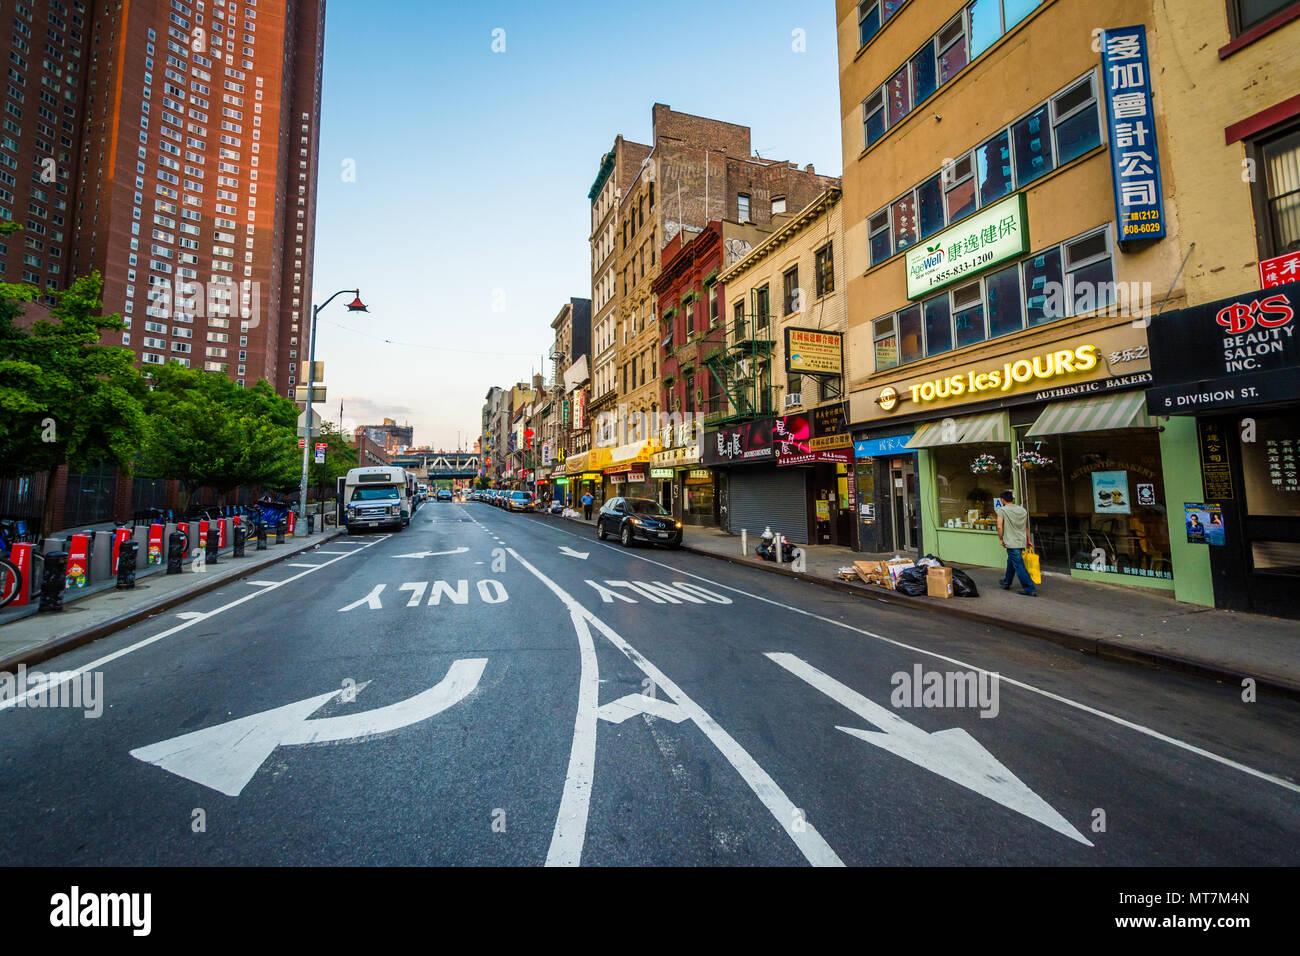 Divison Street, in Chinatown, Manhattan, New York City - Stock Image